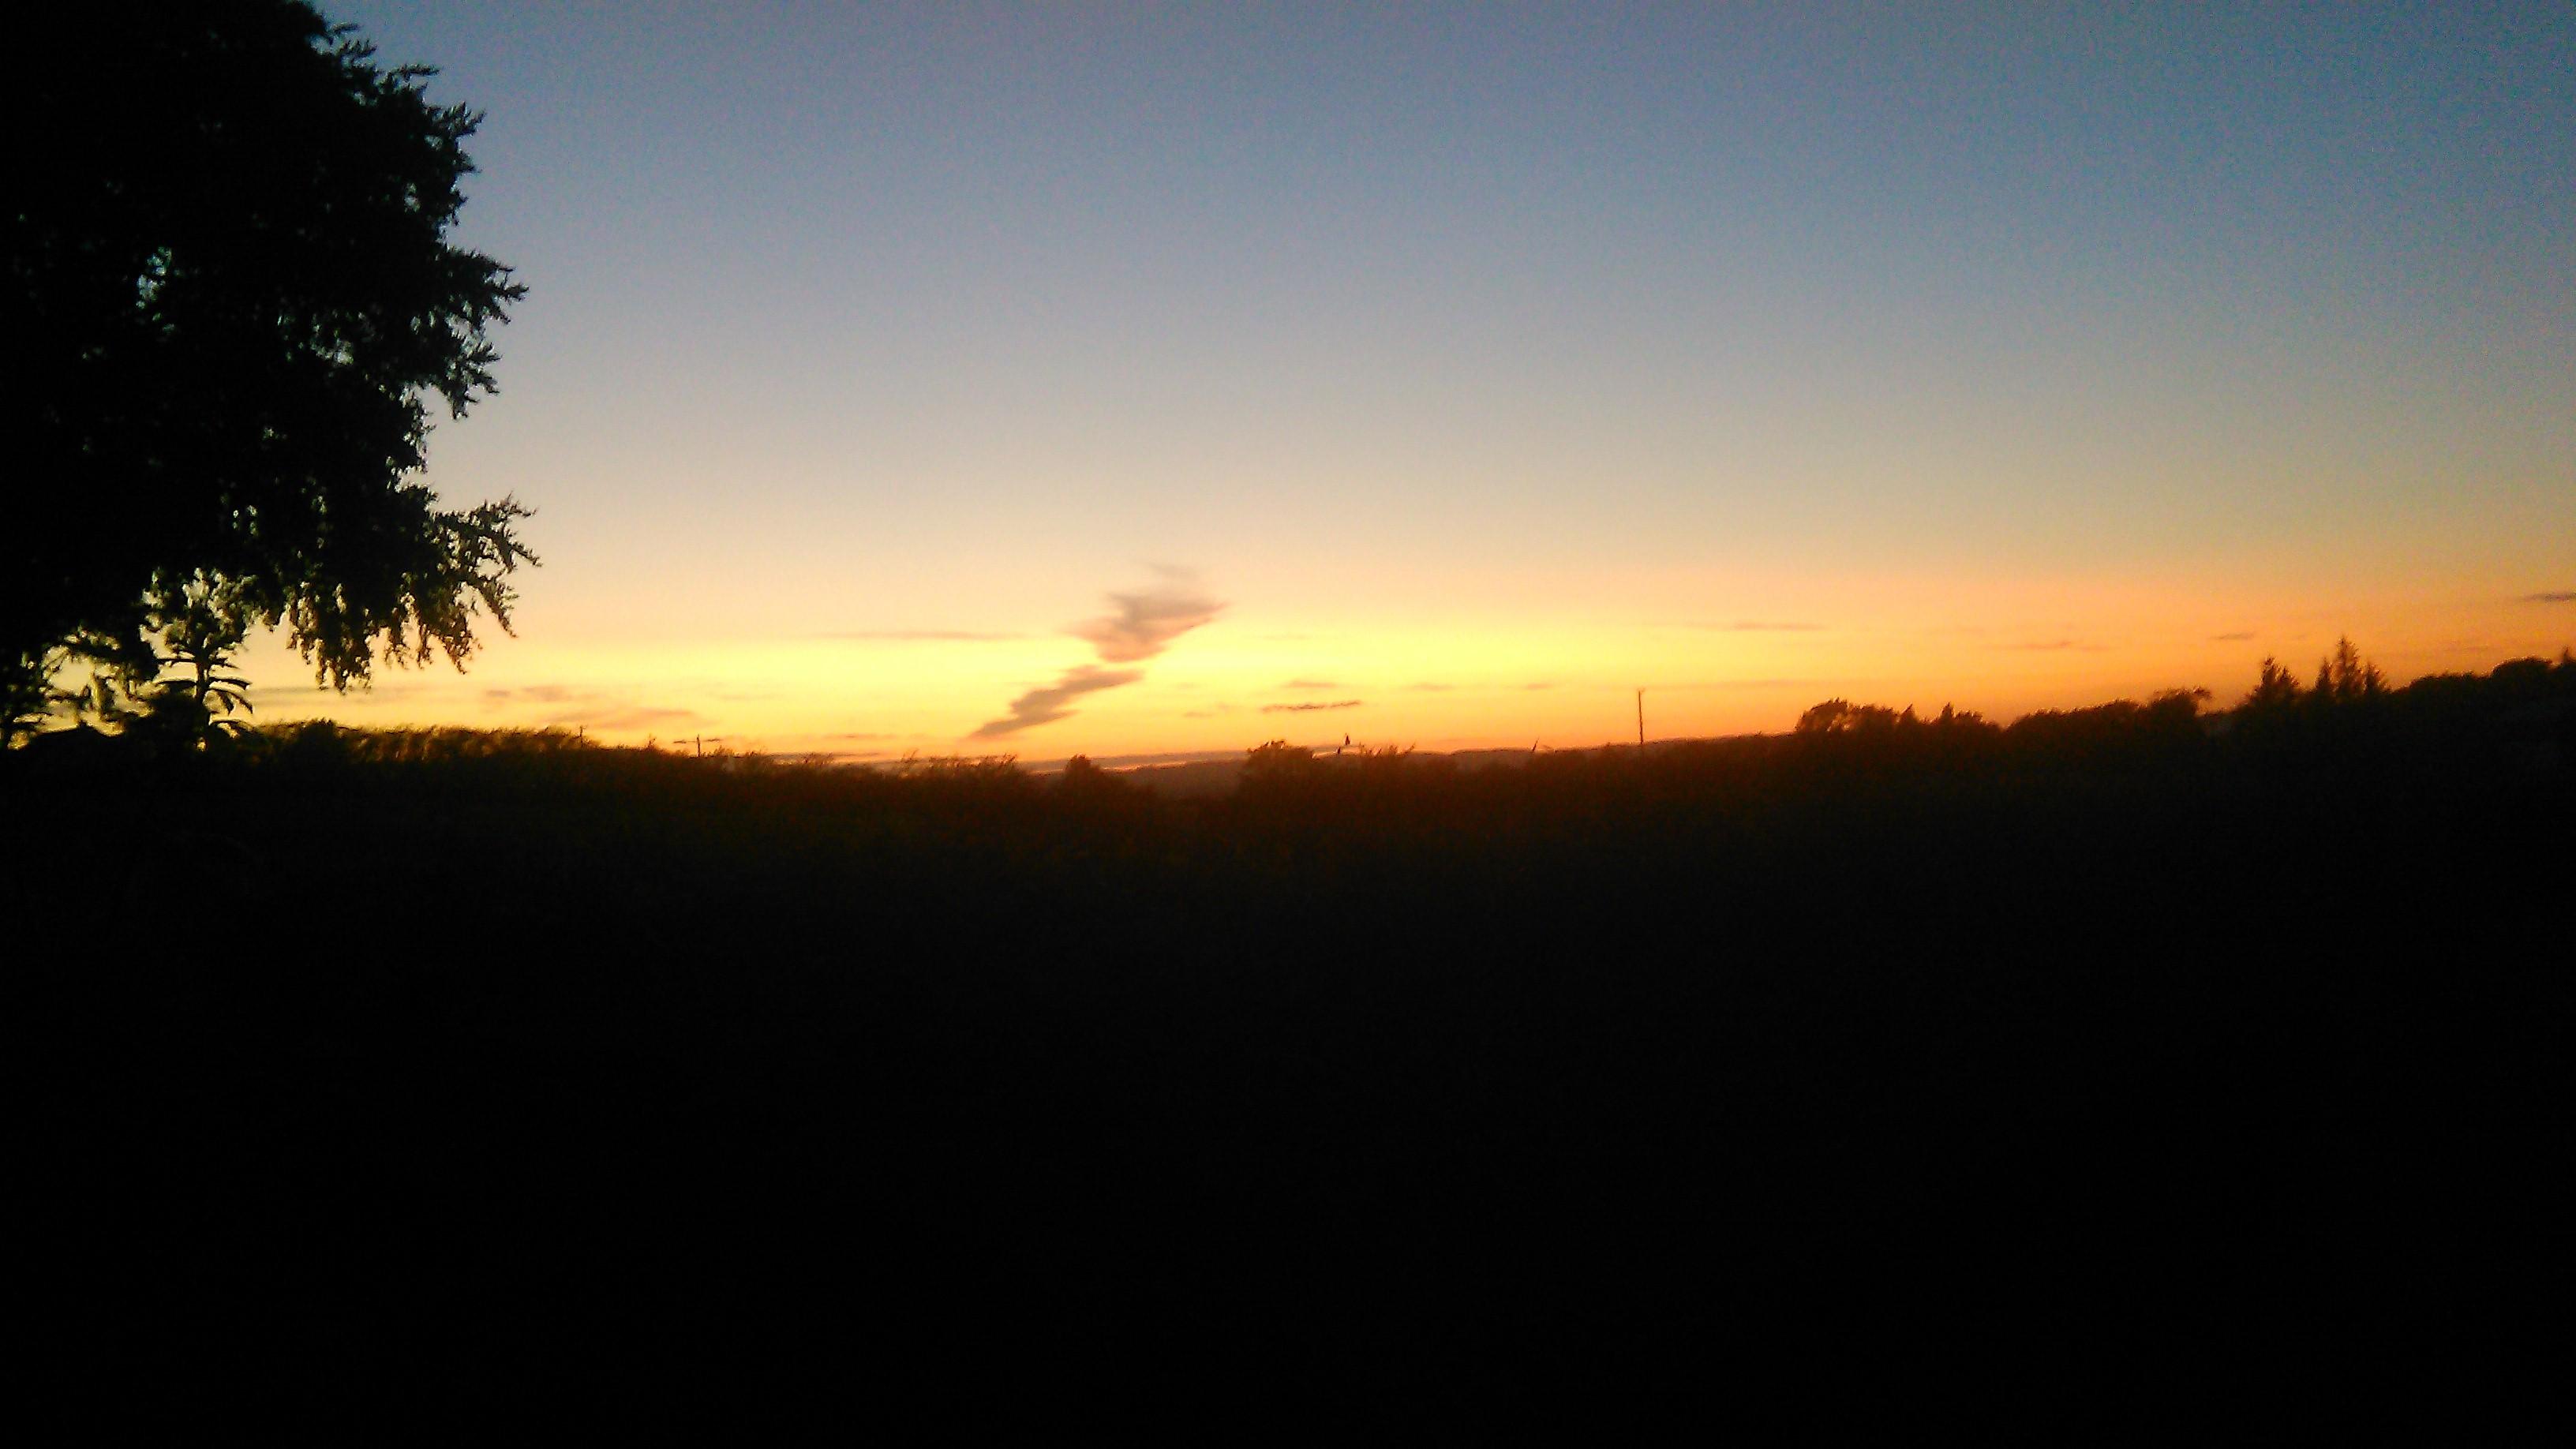 solnedgang i irland